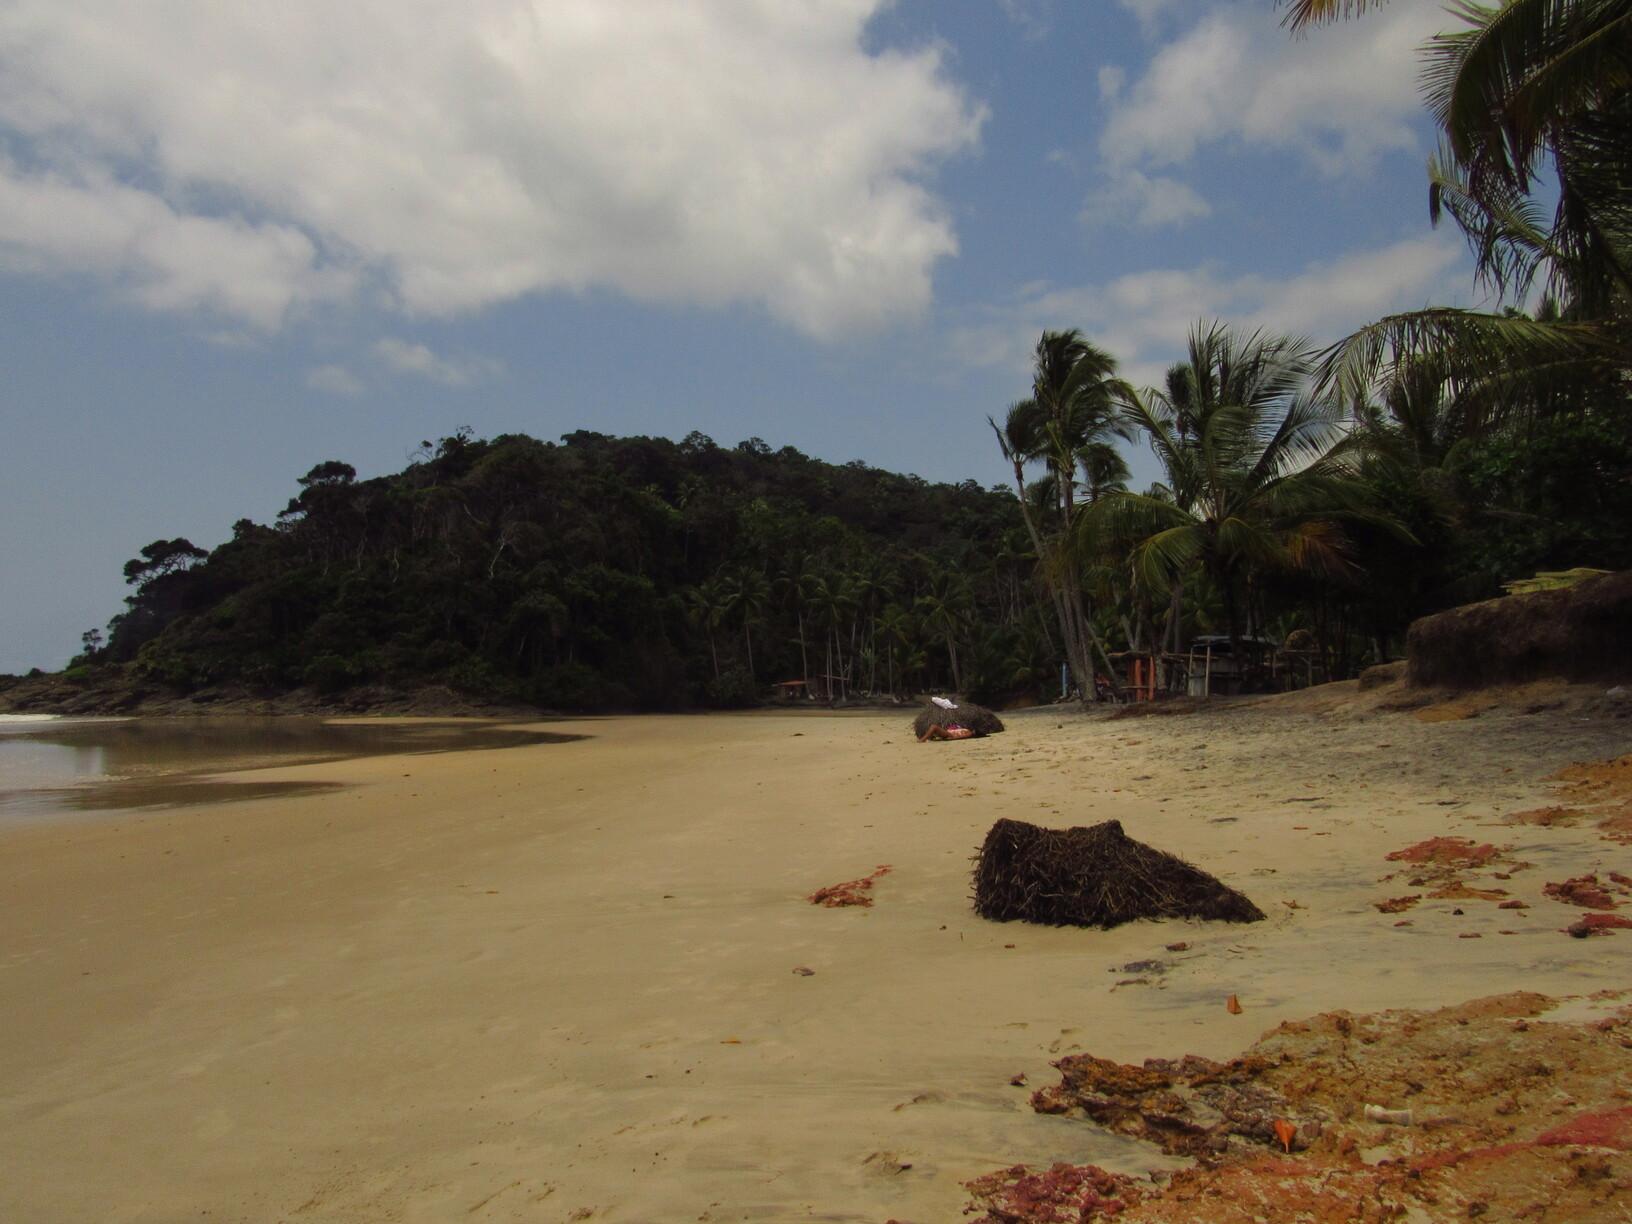 praia da engenhoca itacare bahia